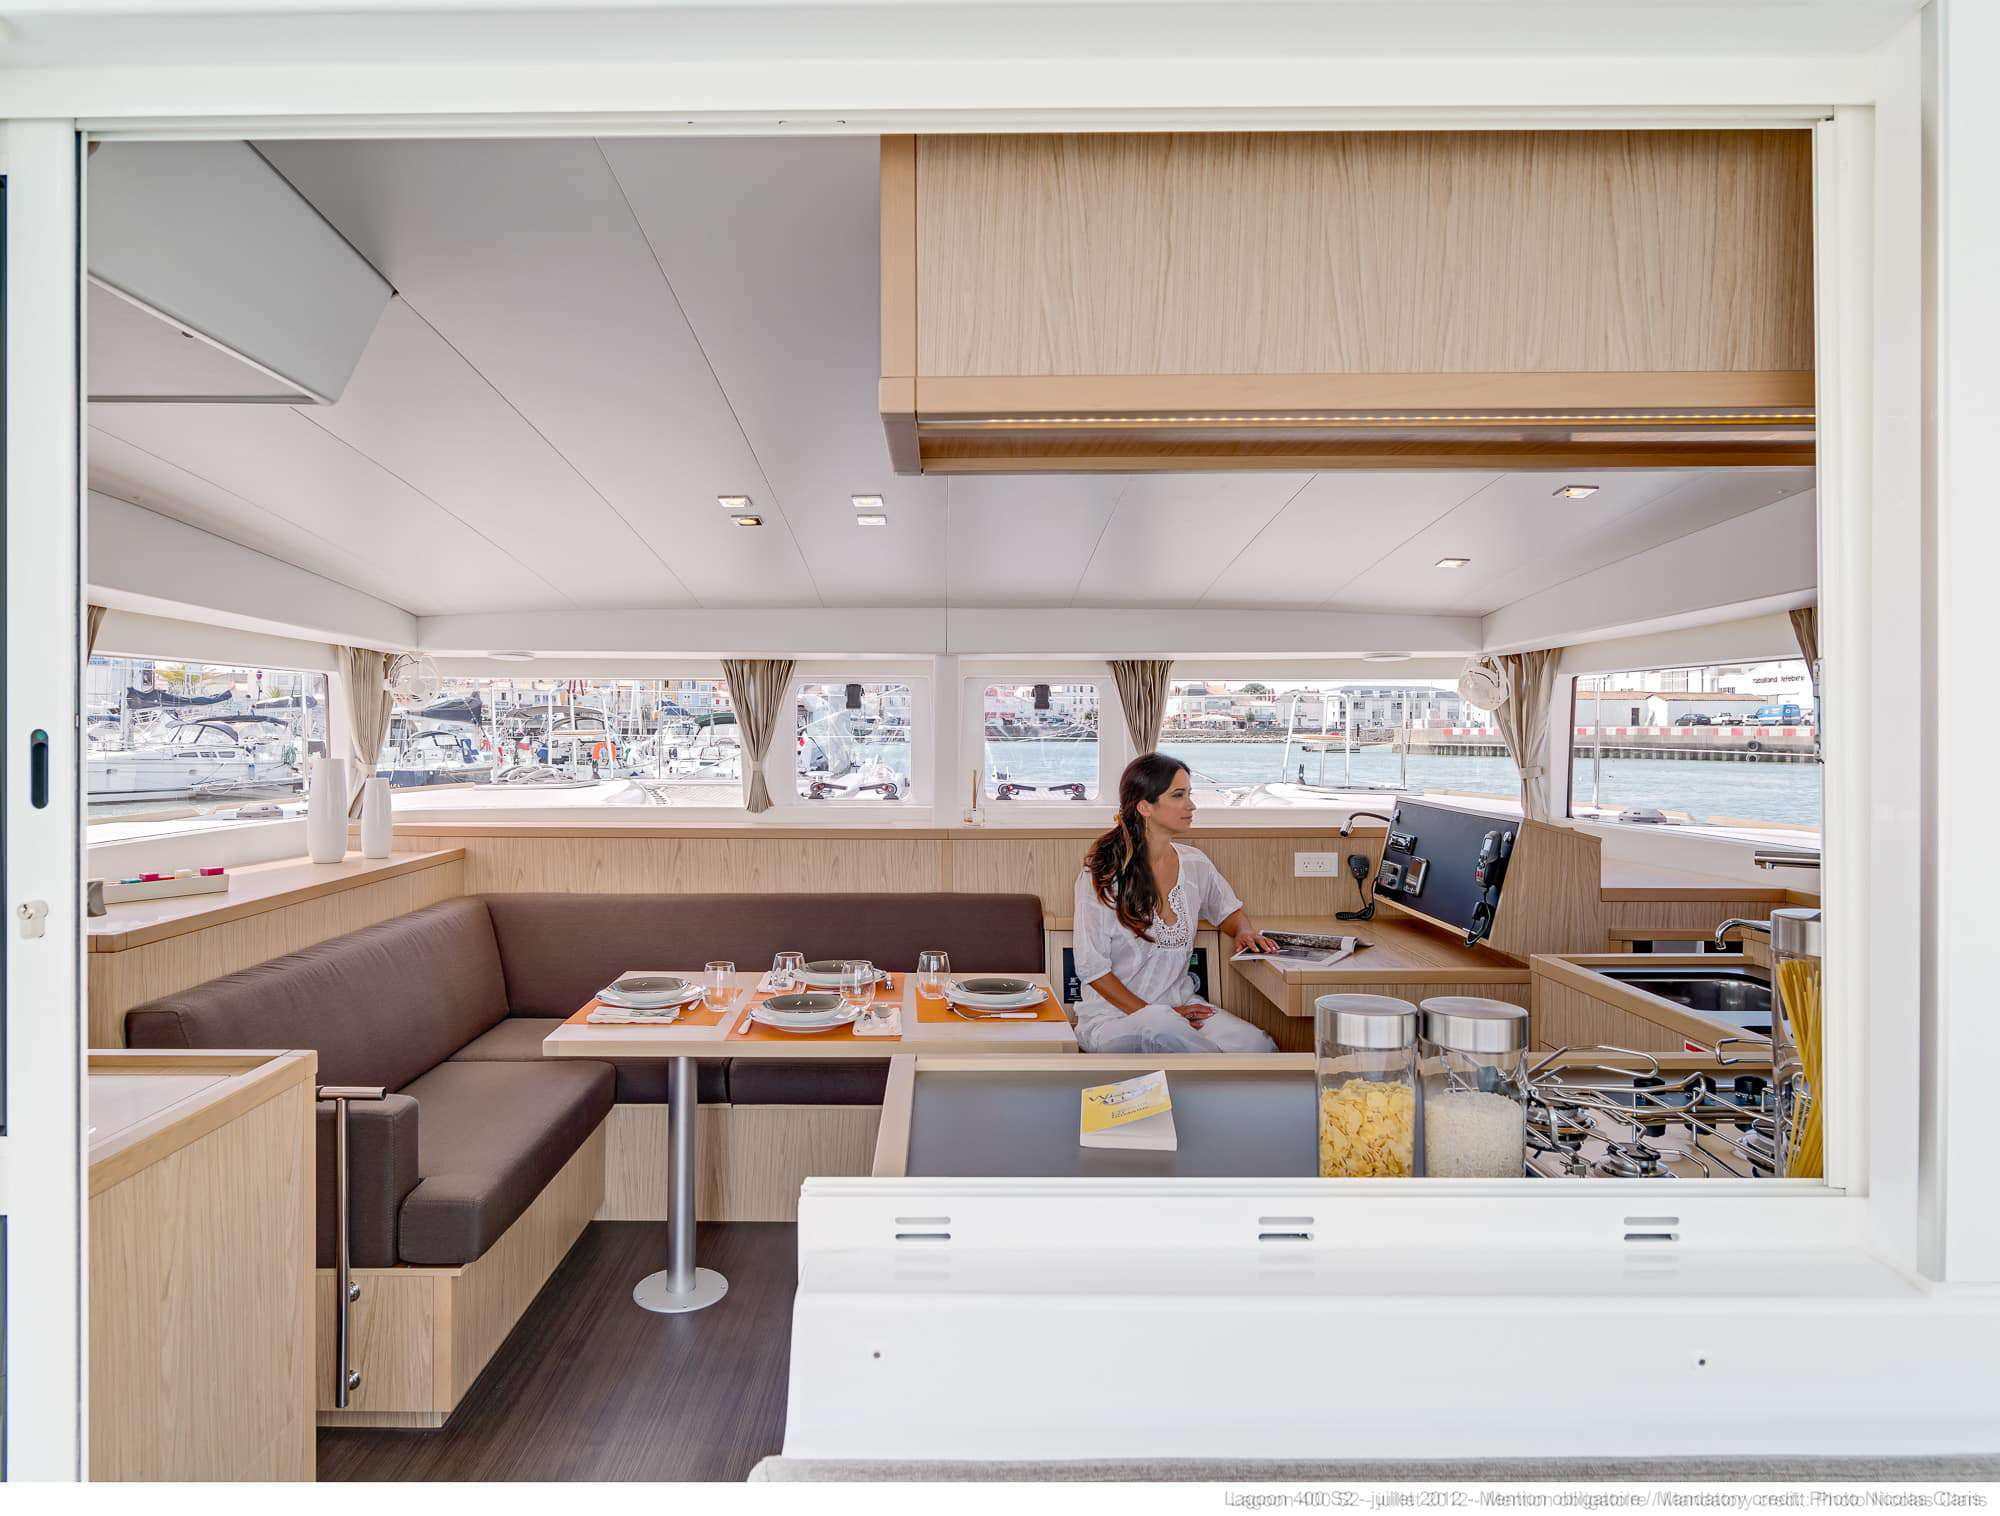 lagoon 400-yacht-charter-croatia-sailing-holidays-croatia-booking-yacht-charter-croatia-catamarans-sailboats-motorboats-gulets-luxury-yachts-boat-rental-croatia 11